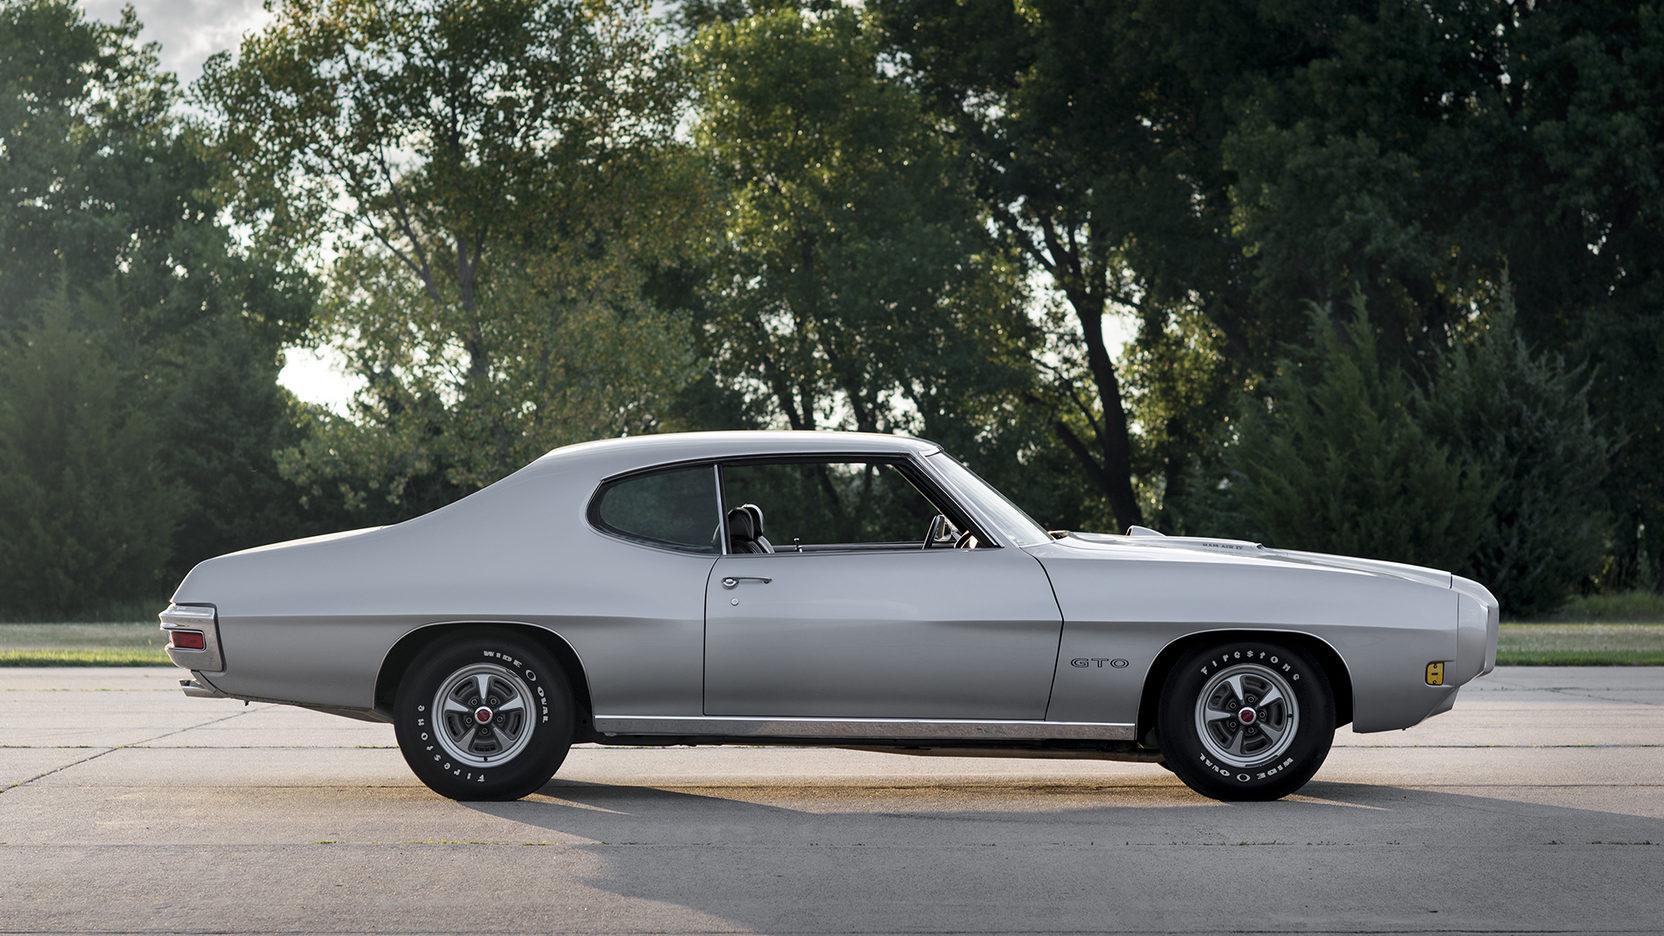 1970 Pontiac GTO Ram Air IV passenger side profile